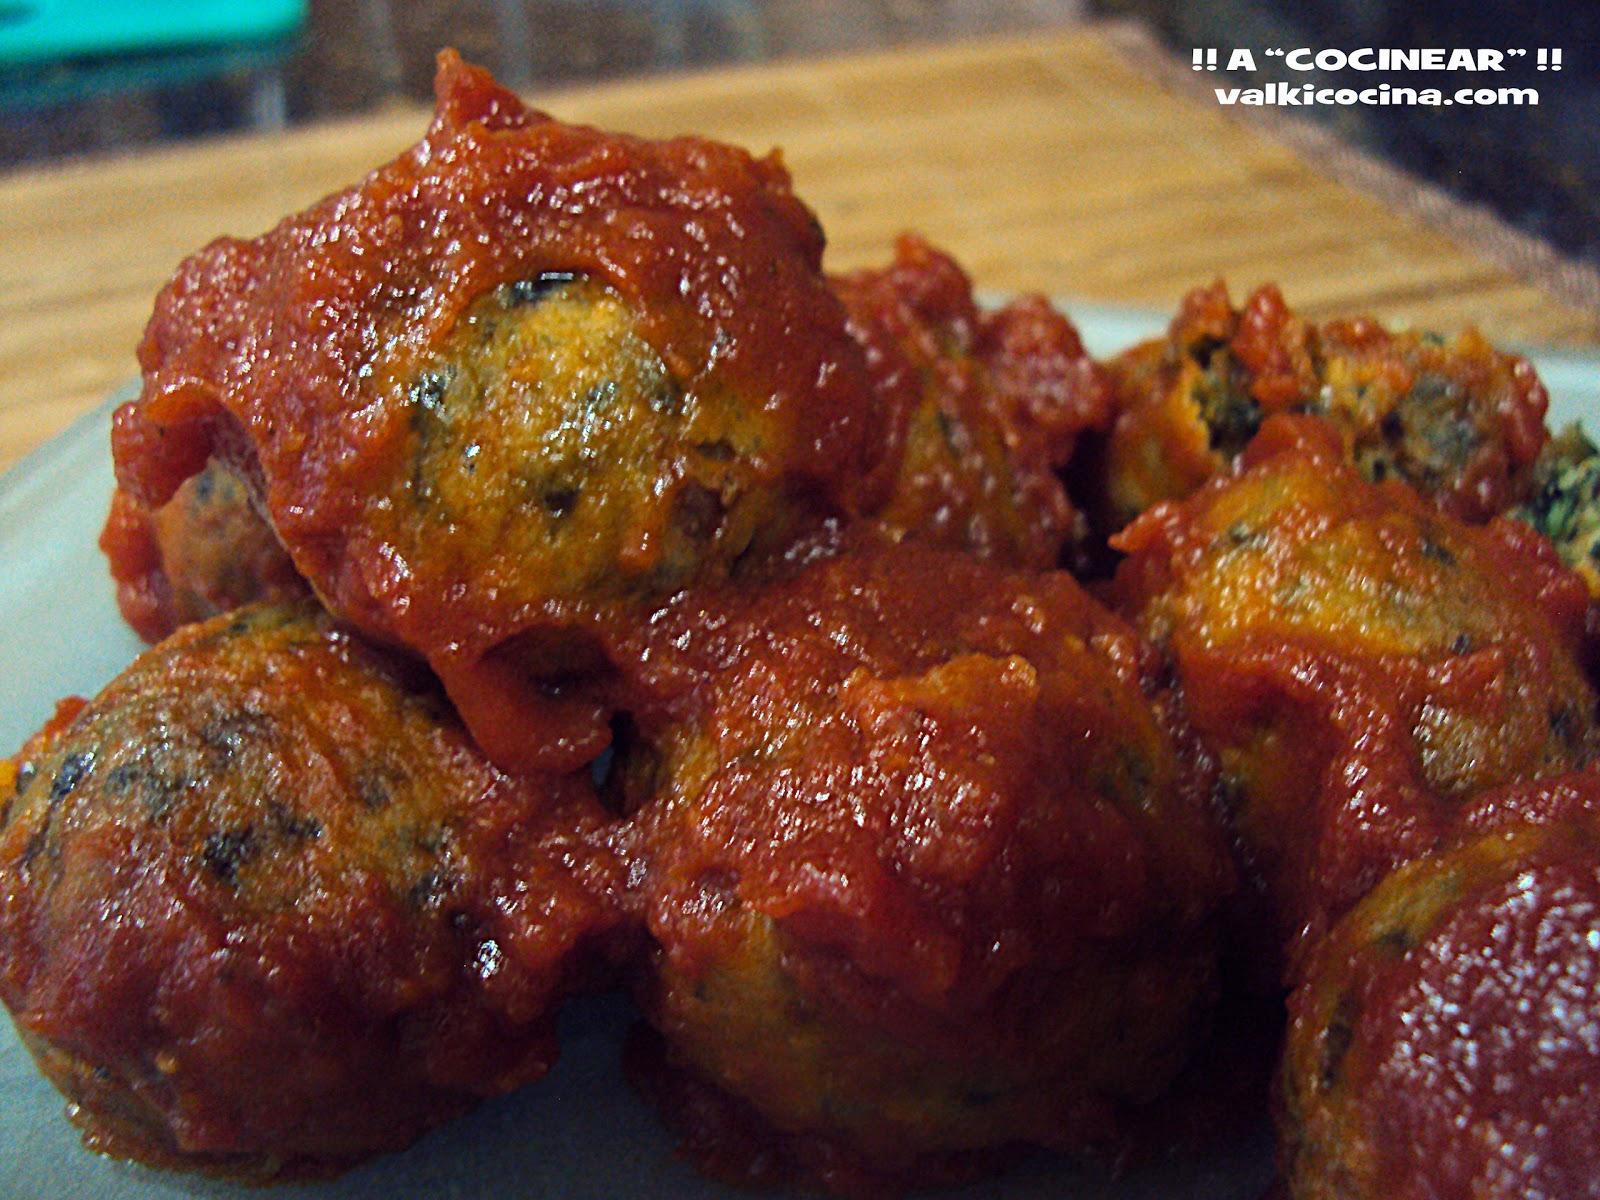 Recetas De Cocina Albondigas   Albondigas De Garbanzos Espinacas Y Pasas En Salsa De Tomate